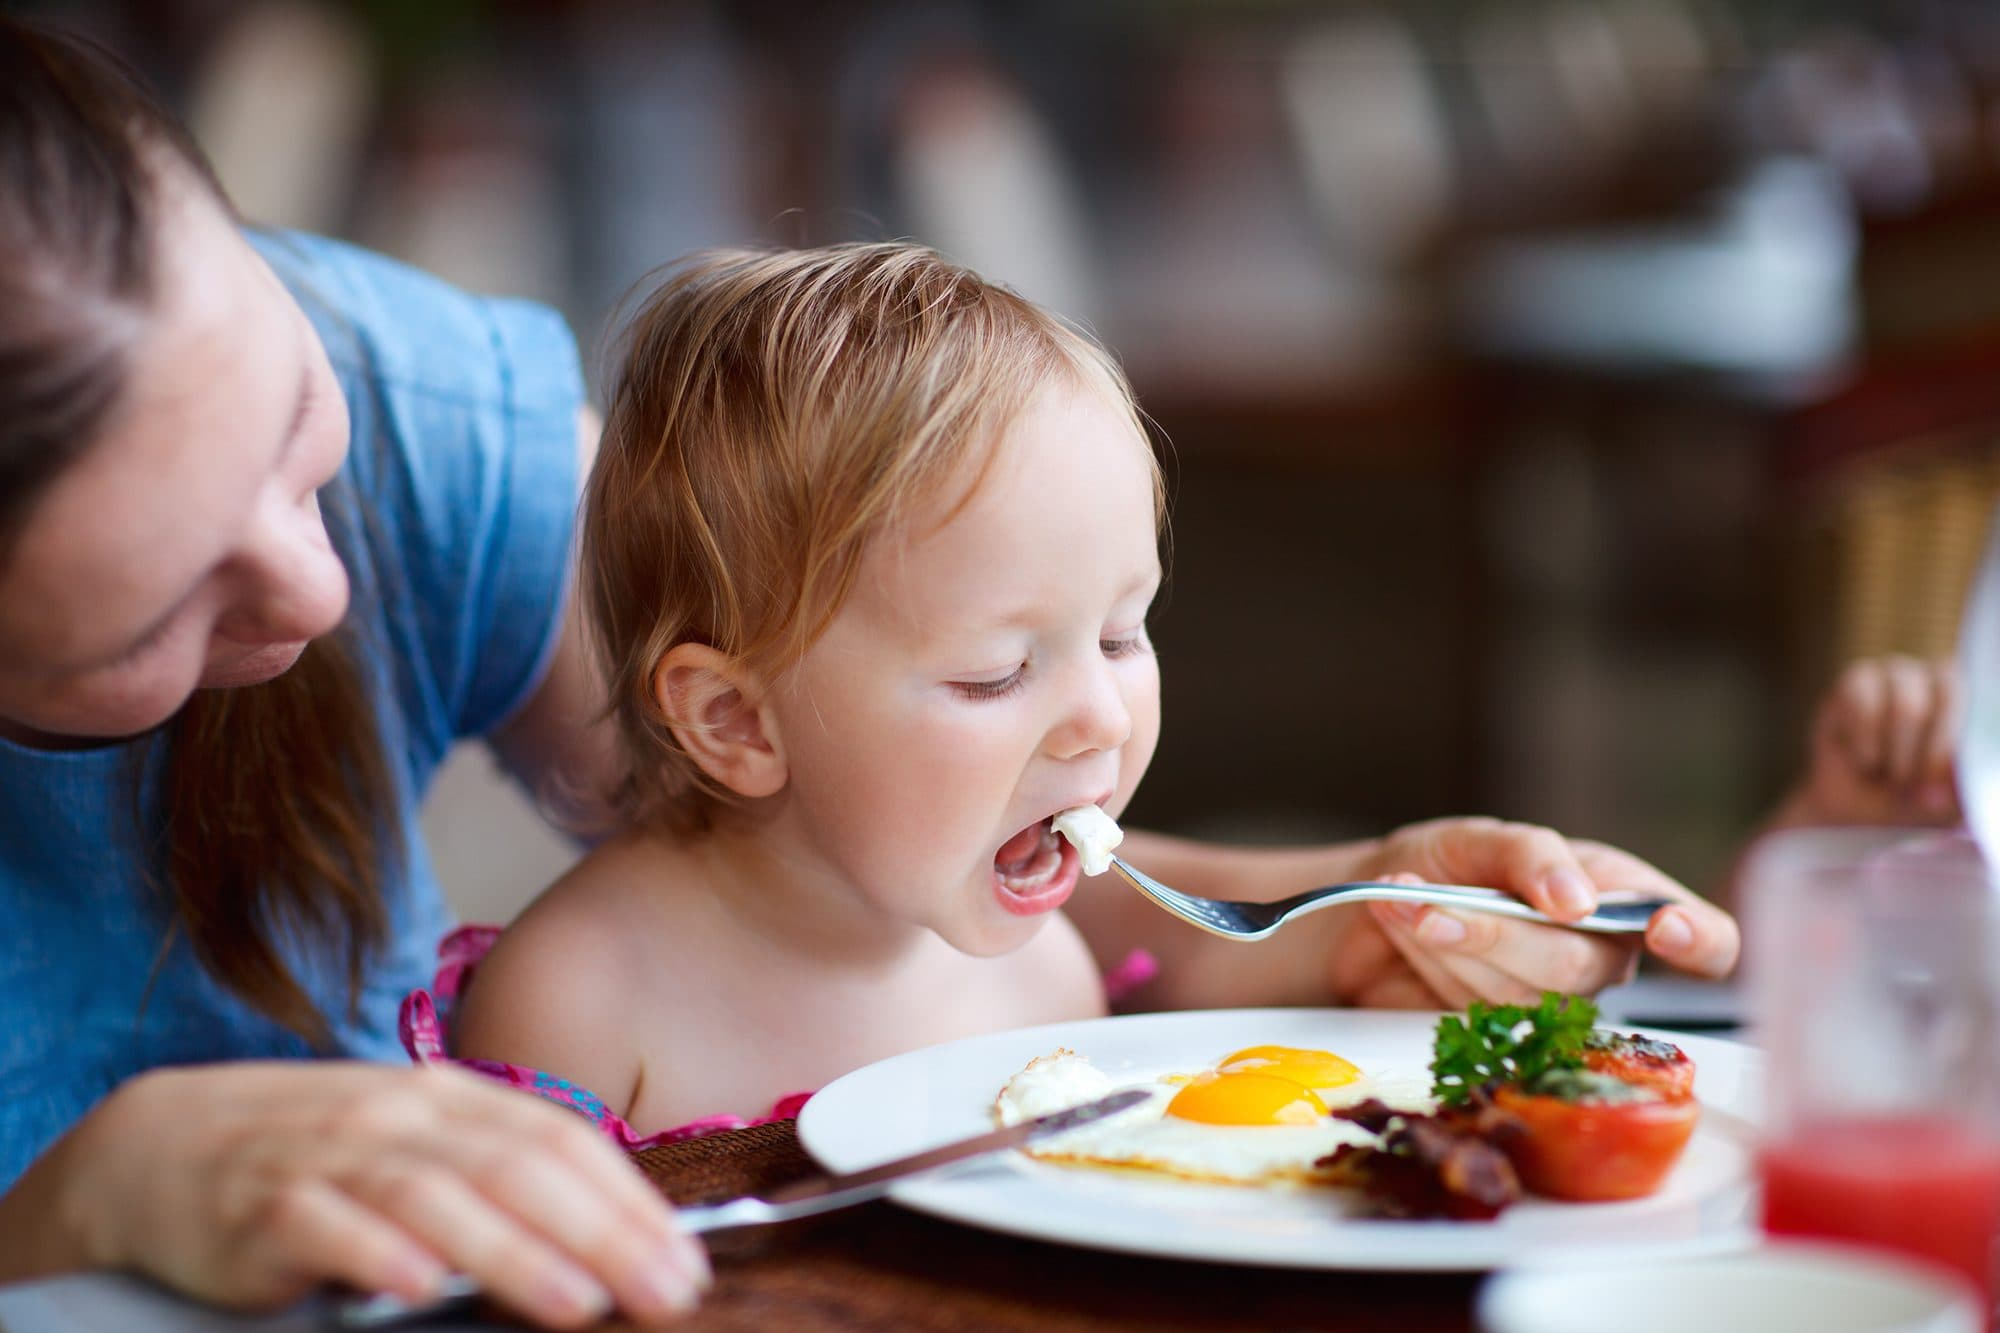 Little kids often eat free at hotel restaurants